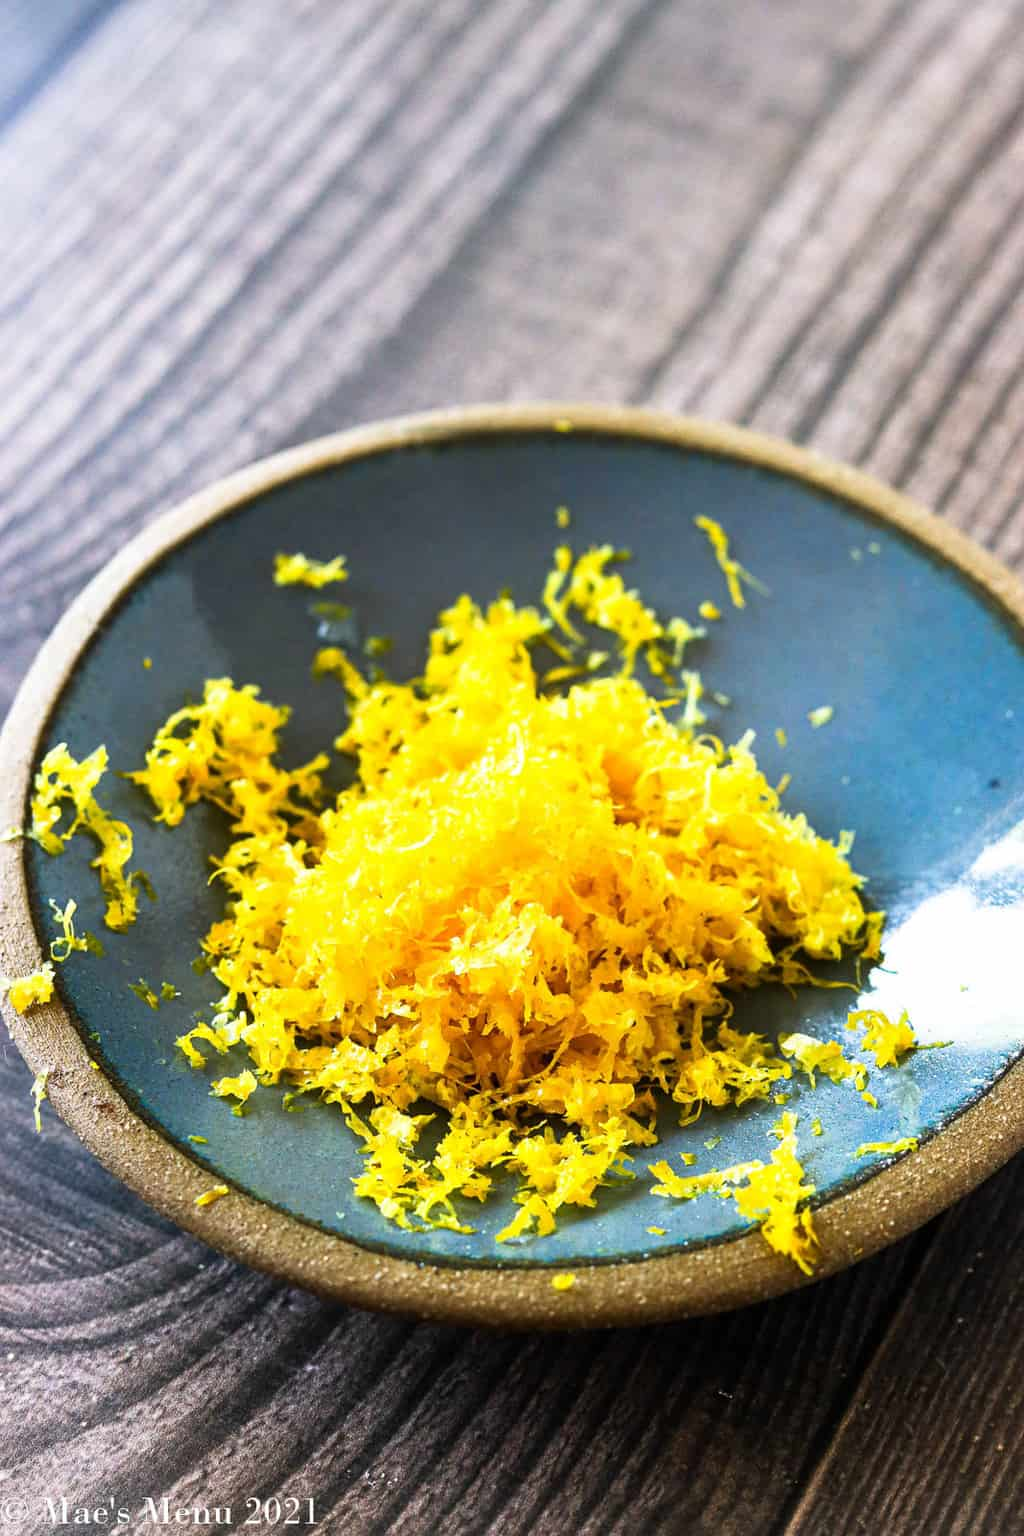 A side shot of a small dish of lemon zest